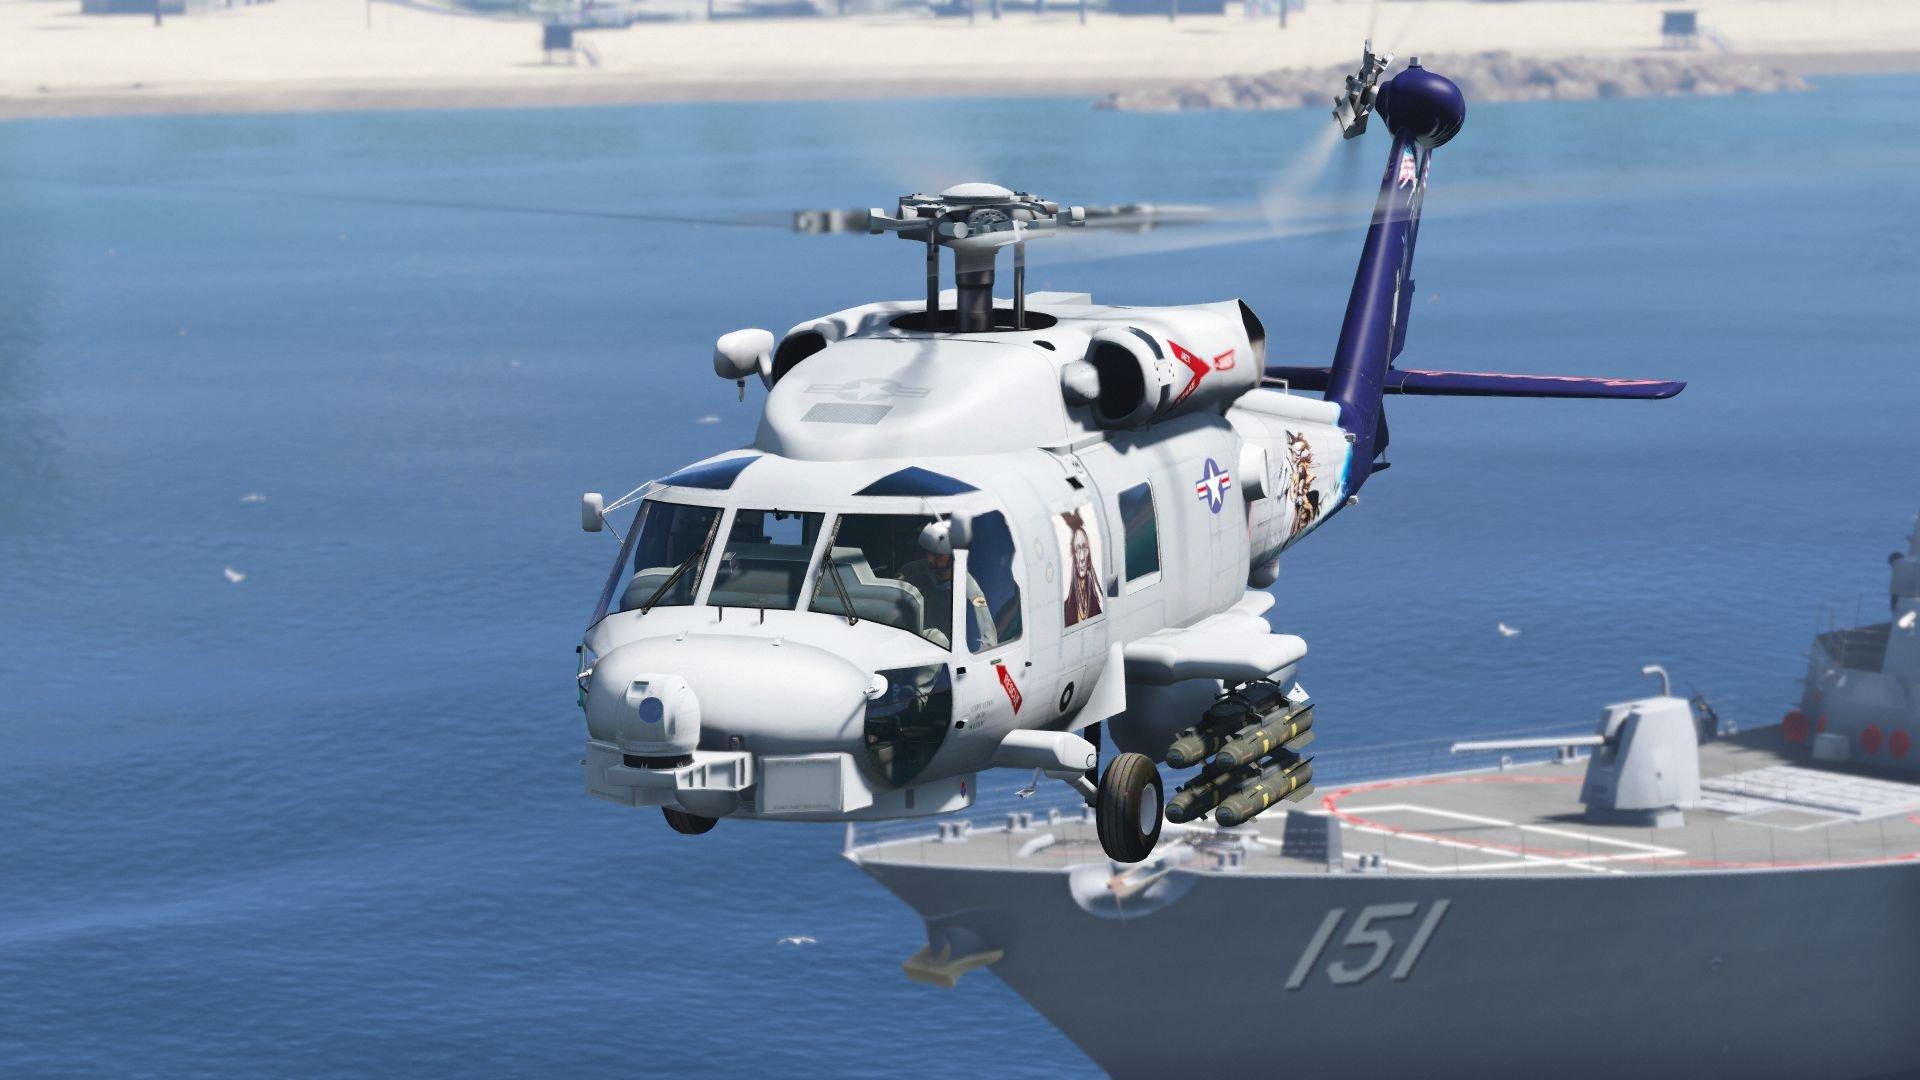 Картинки по запросу MH-60R Seahawk